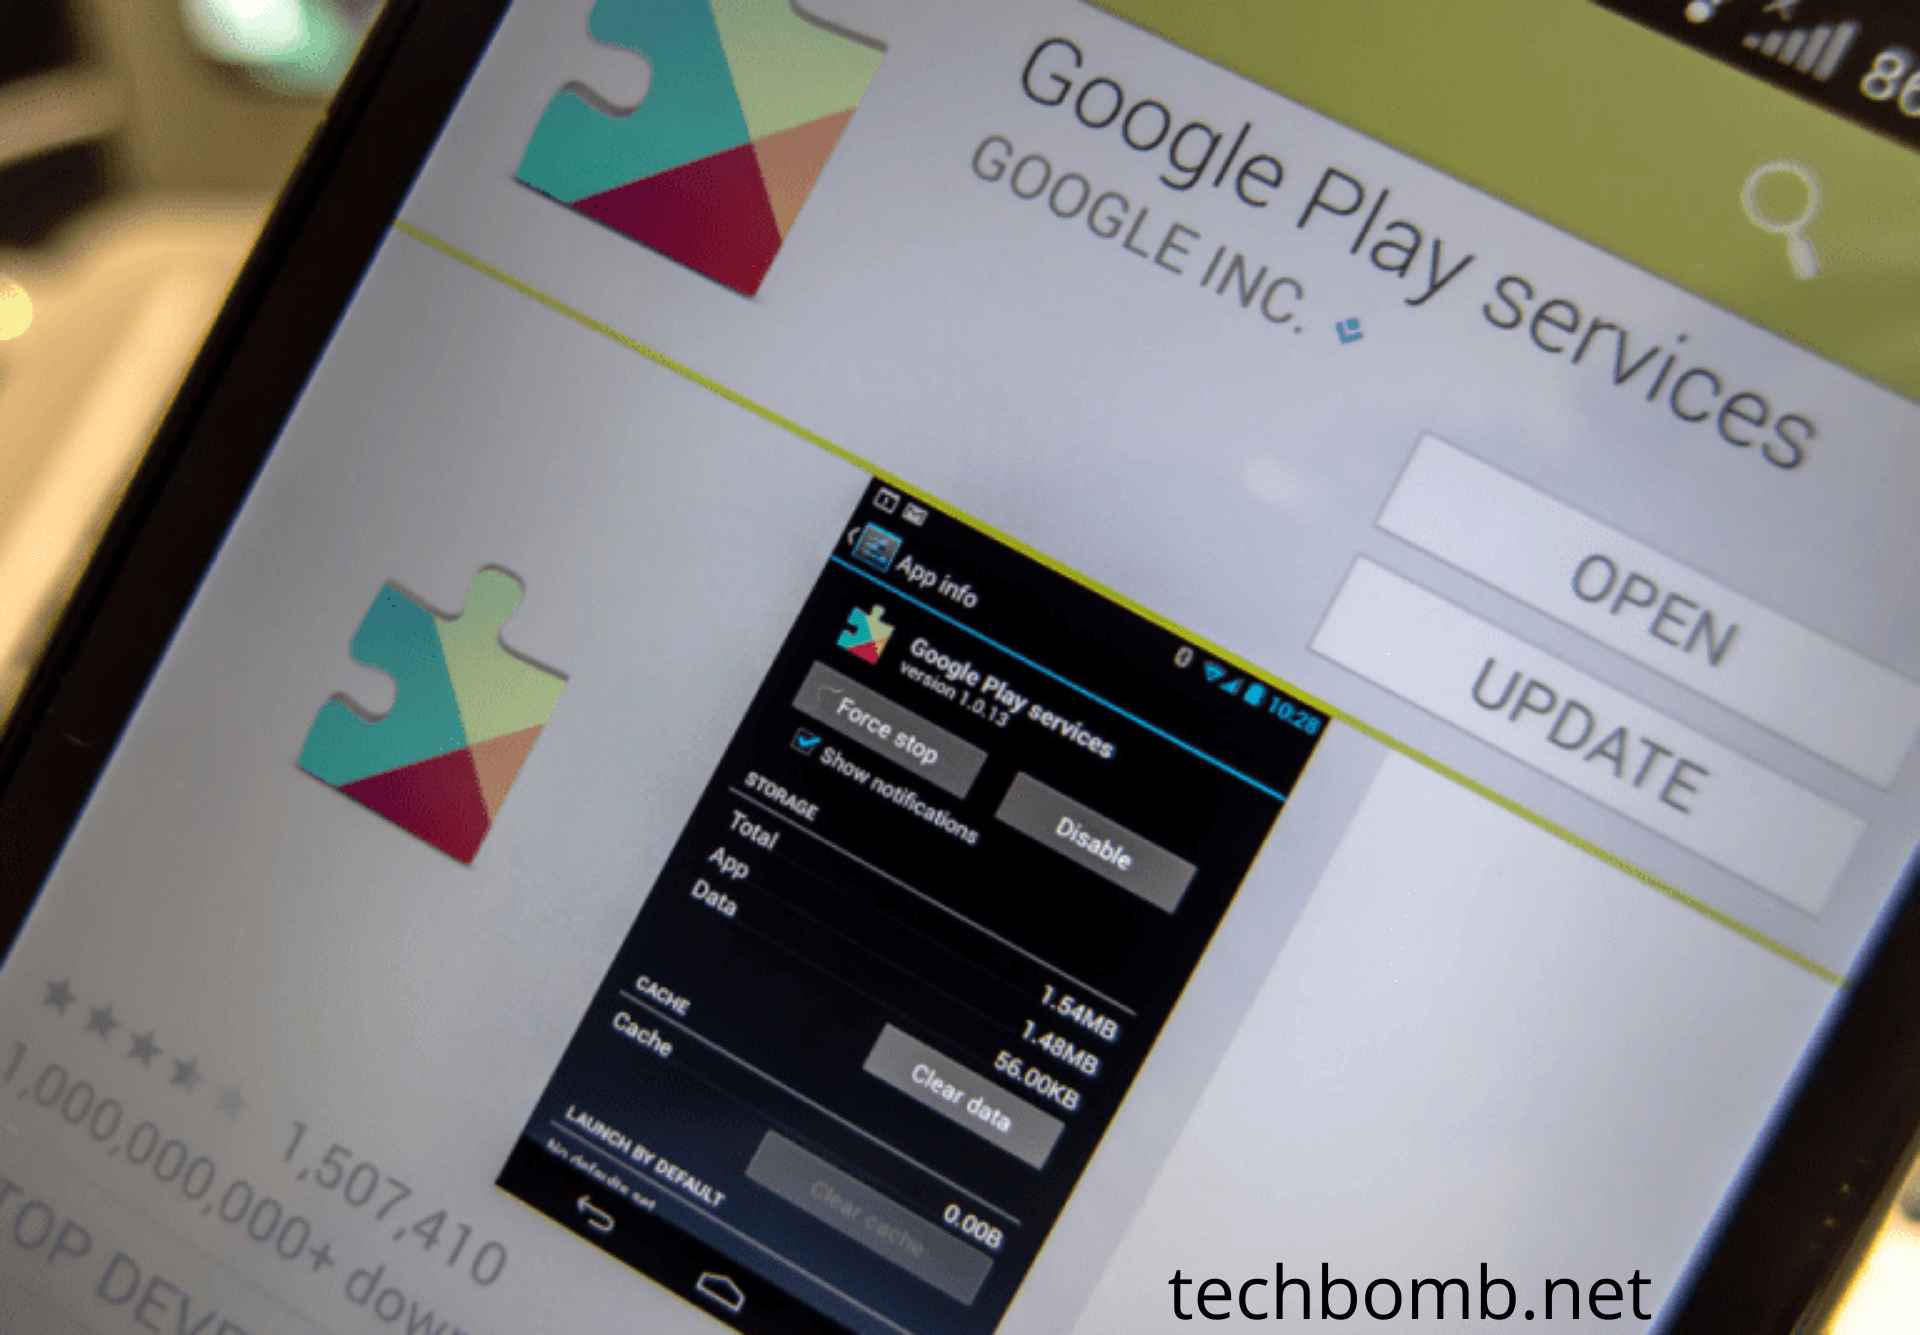 Google Play Services Error 2